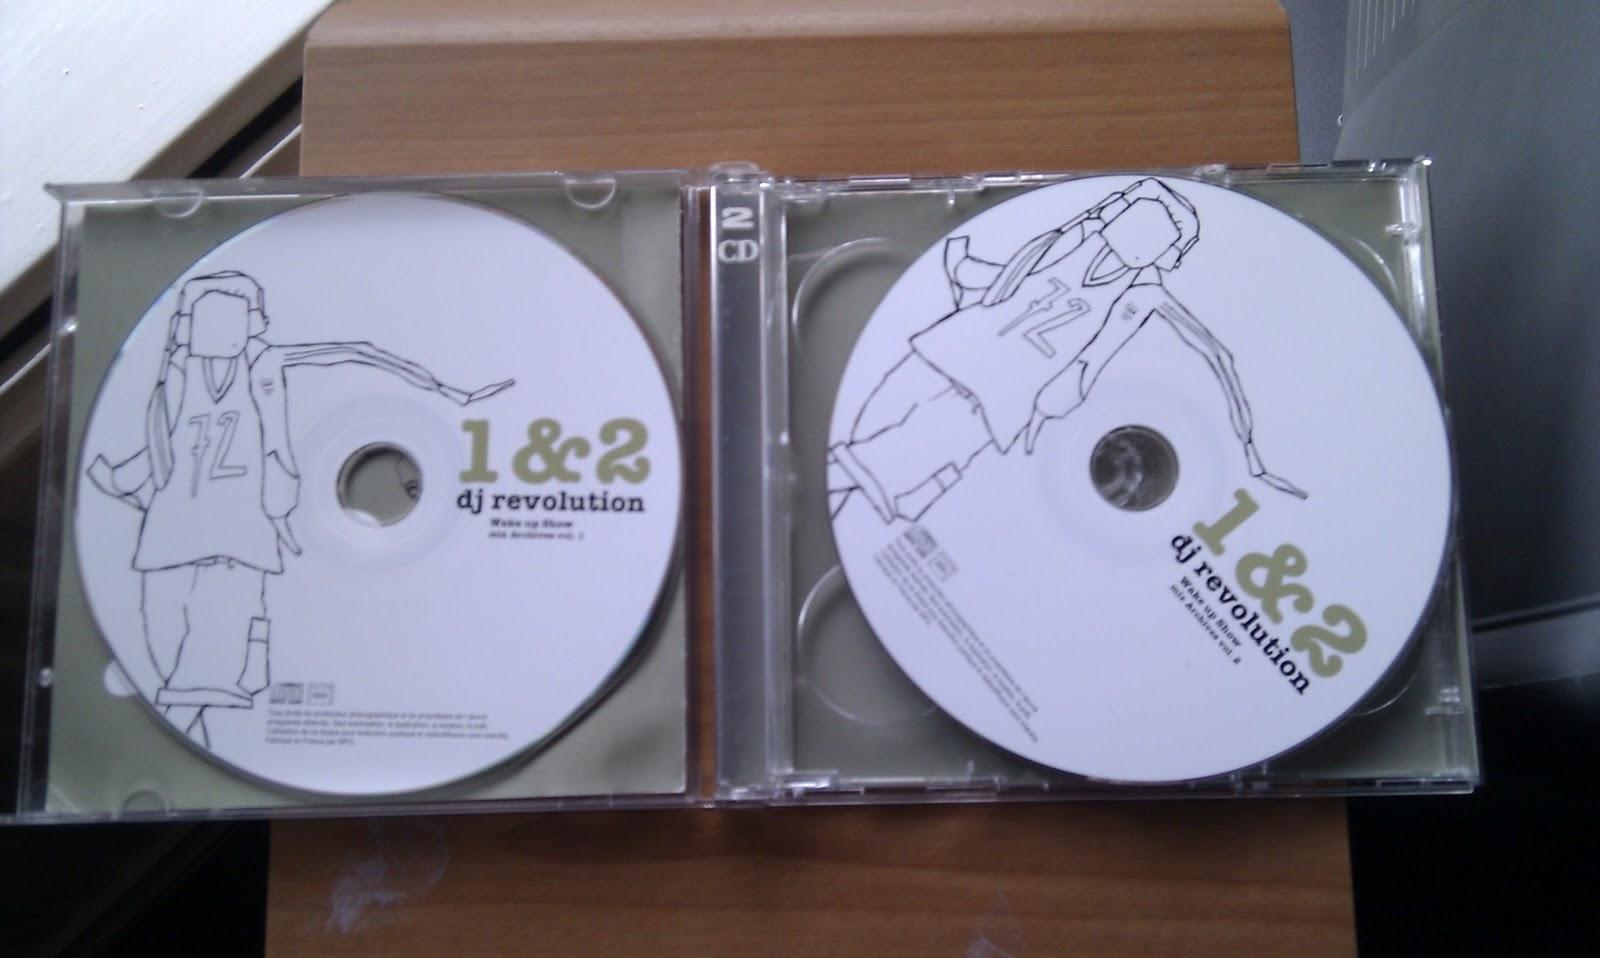 http://1.bp.blogspot.com/_5cGQkKyh9go/TFcM5jEO5FI/AAAAAAAAAqk/asCXTZBry1w/s1600/000-dj_revolution-wake_up_show_mix_archives_vol._1_%26_2-2cd-2004-inlay-ltbb.jpg